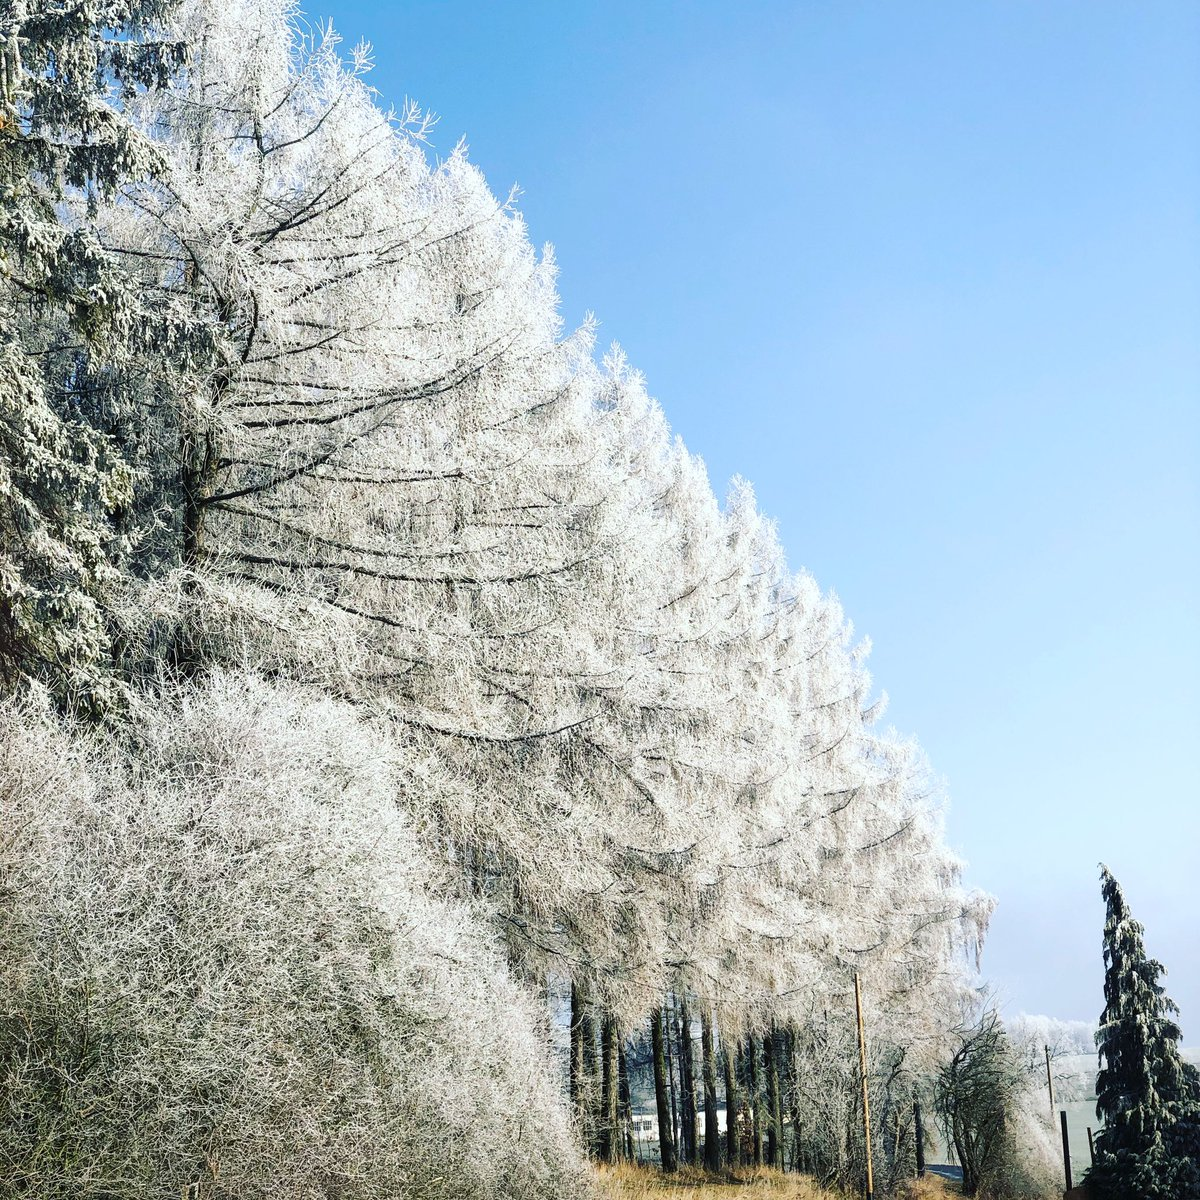 #frost #frosty #eisig #winter #rime #reif #blauerhimmel #adventure #adventureofalifetime #vivalavida #abenteuer #abenteuerleben #championoftheworld  #travel #travelphotography #reise #reisen #reisefotografie  #nature #natur #landscape #landschaft #landschaftsfotografie pic.twitter.com/yPLurOCjfm